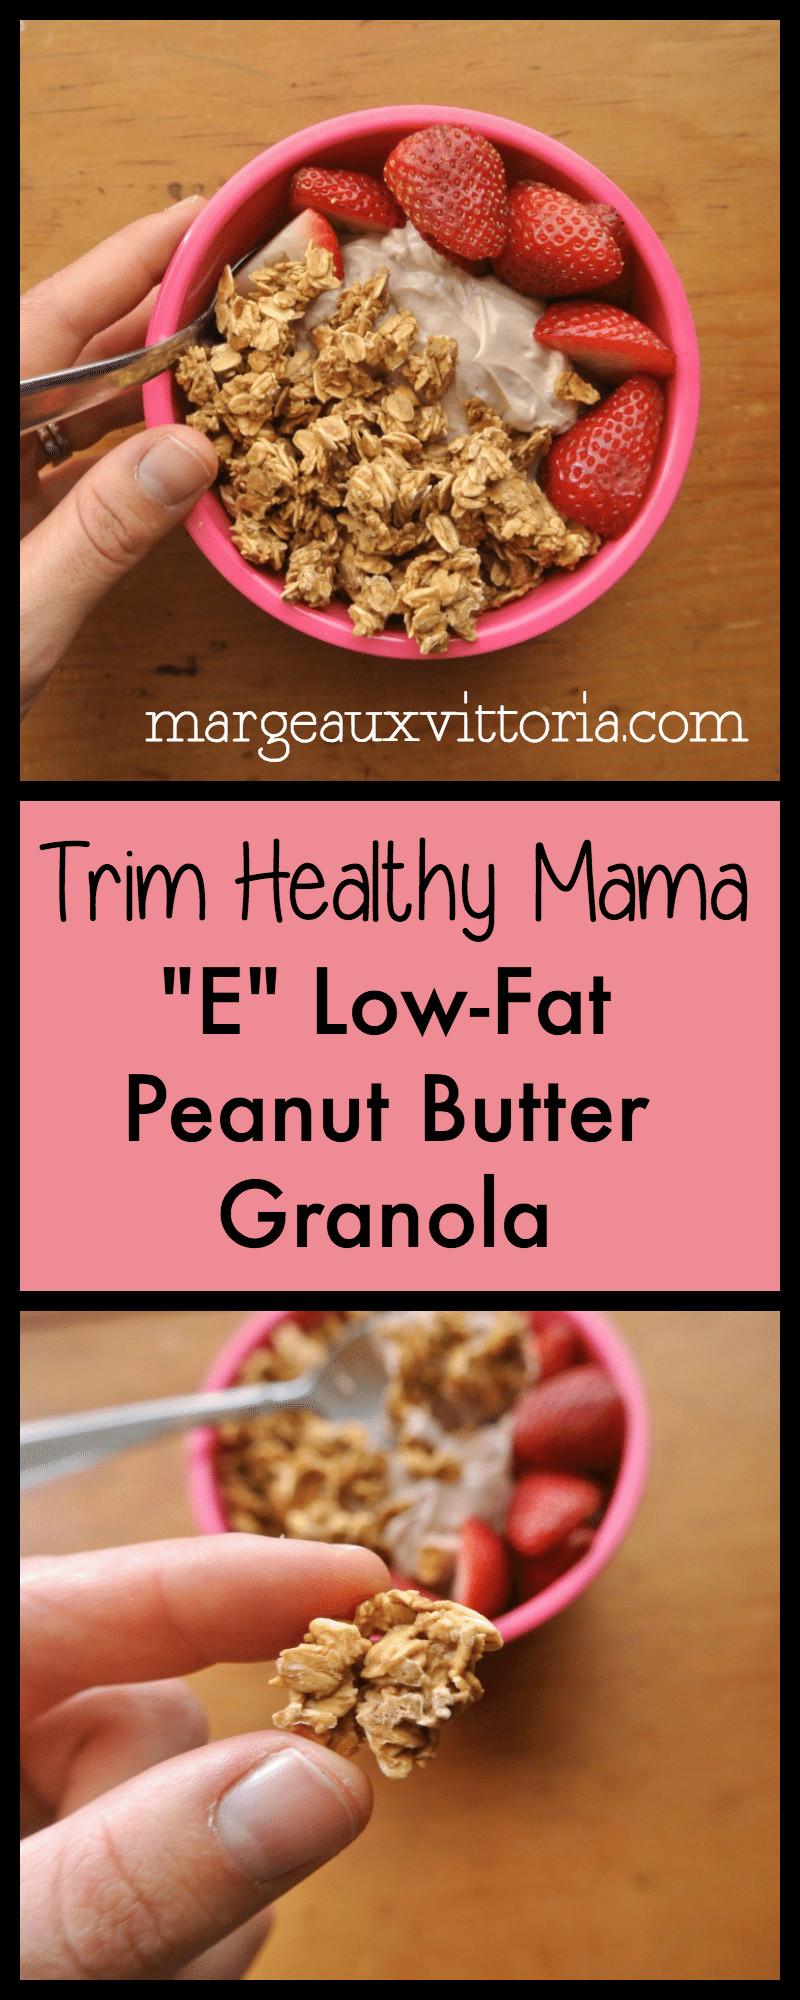 "Trim Healthy Mama Recipes Breakfast  Trim Healthy Mama ""E"" Low Fat Peanut Butter Granola"